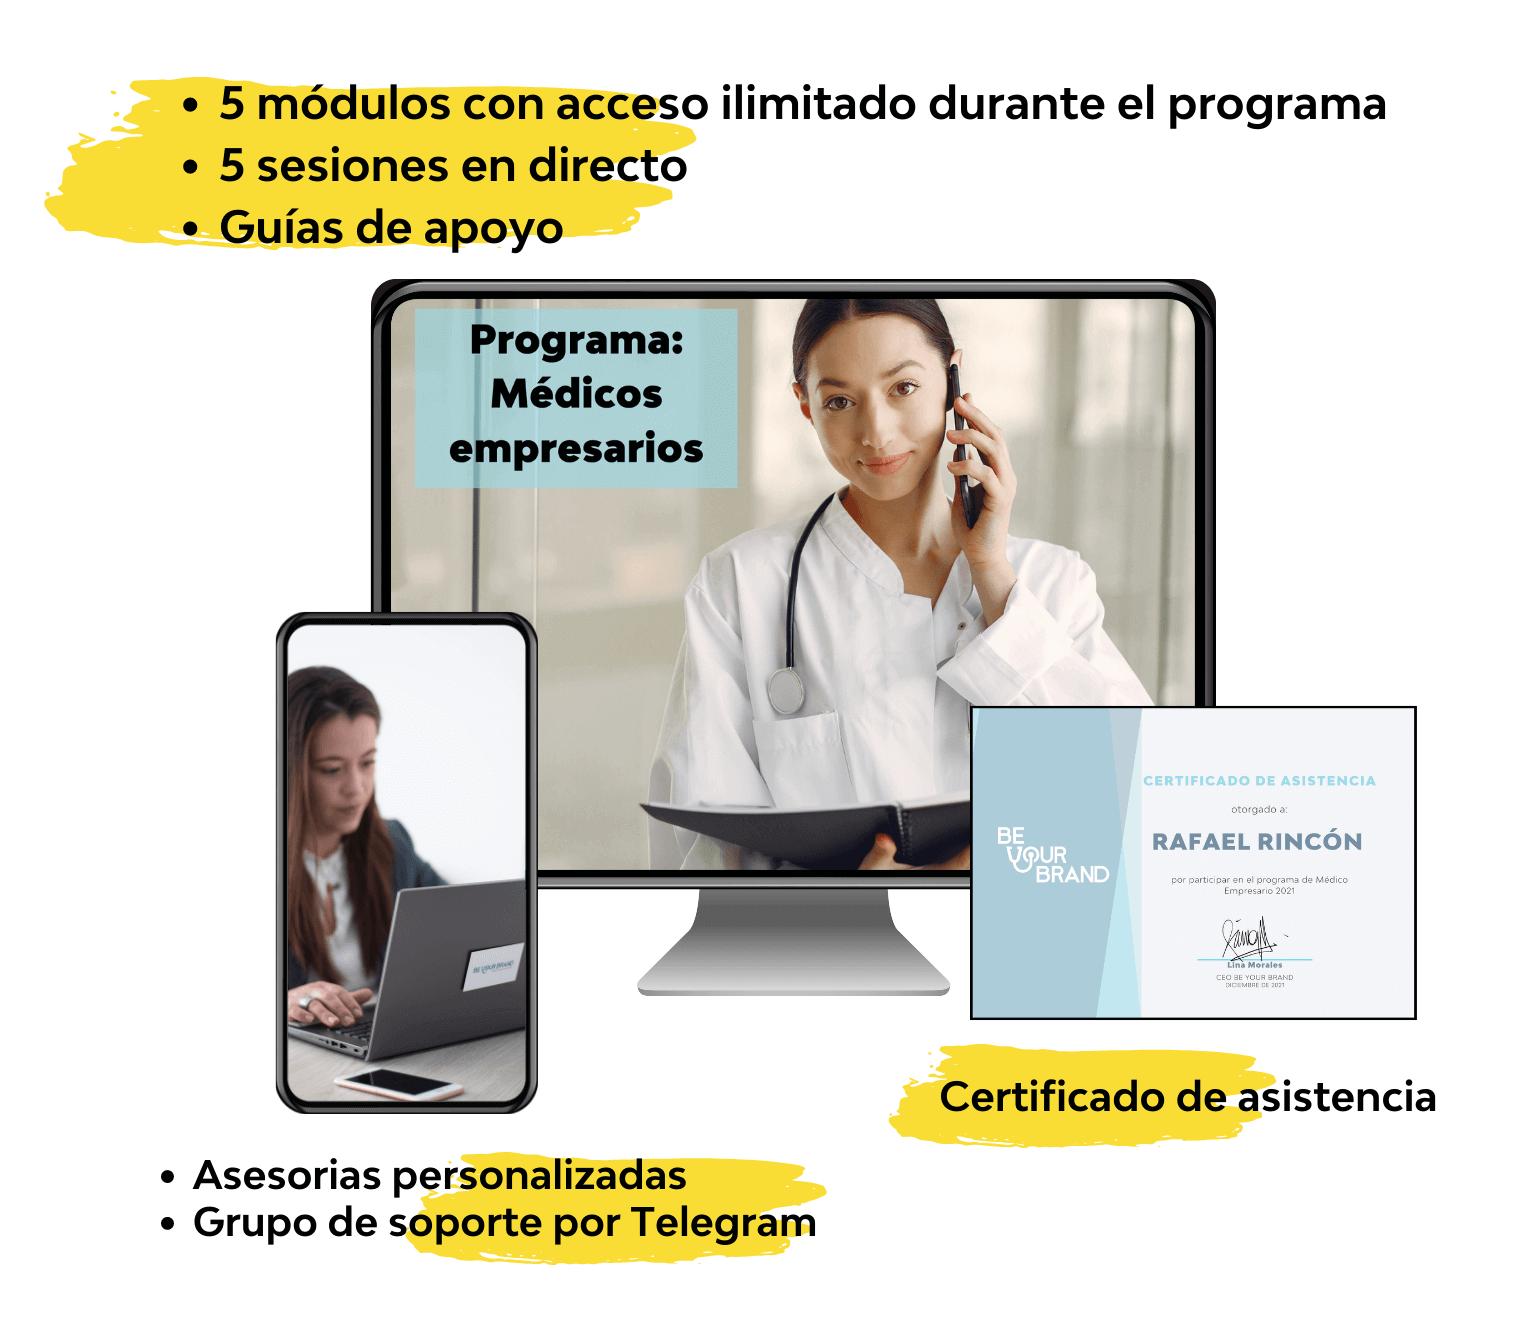 Programa médicos empresarios